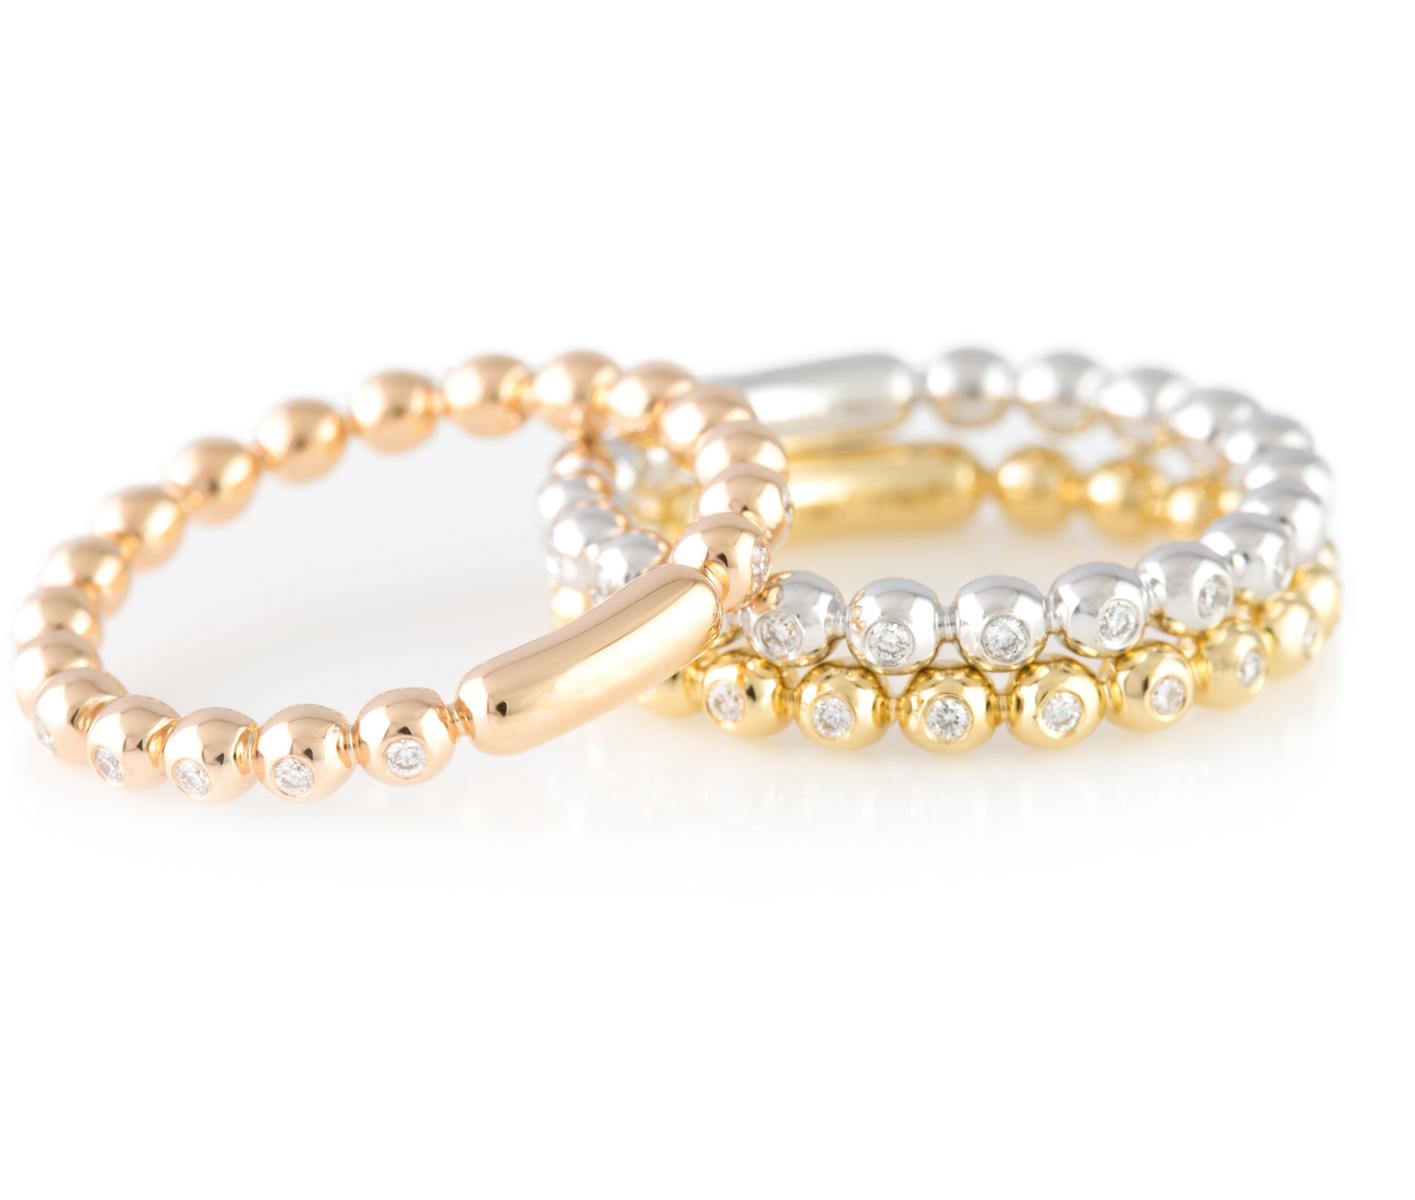 miriams jewelry diamond eternity band 18k yellow gold. Black Bedroom Furniture Sets. Home Design Ideas